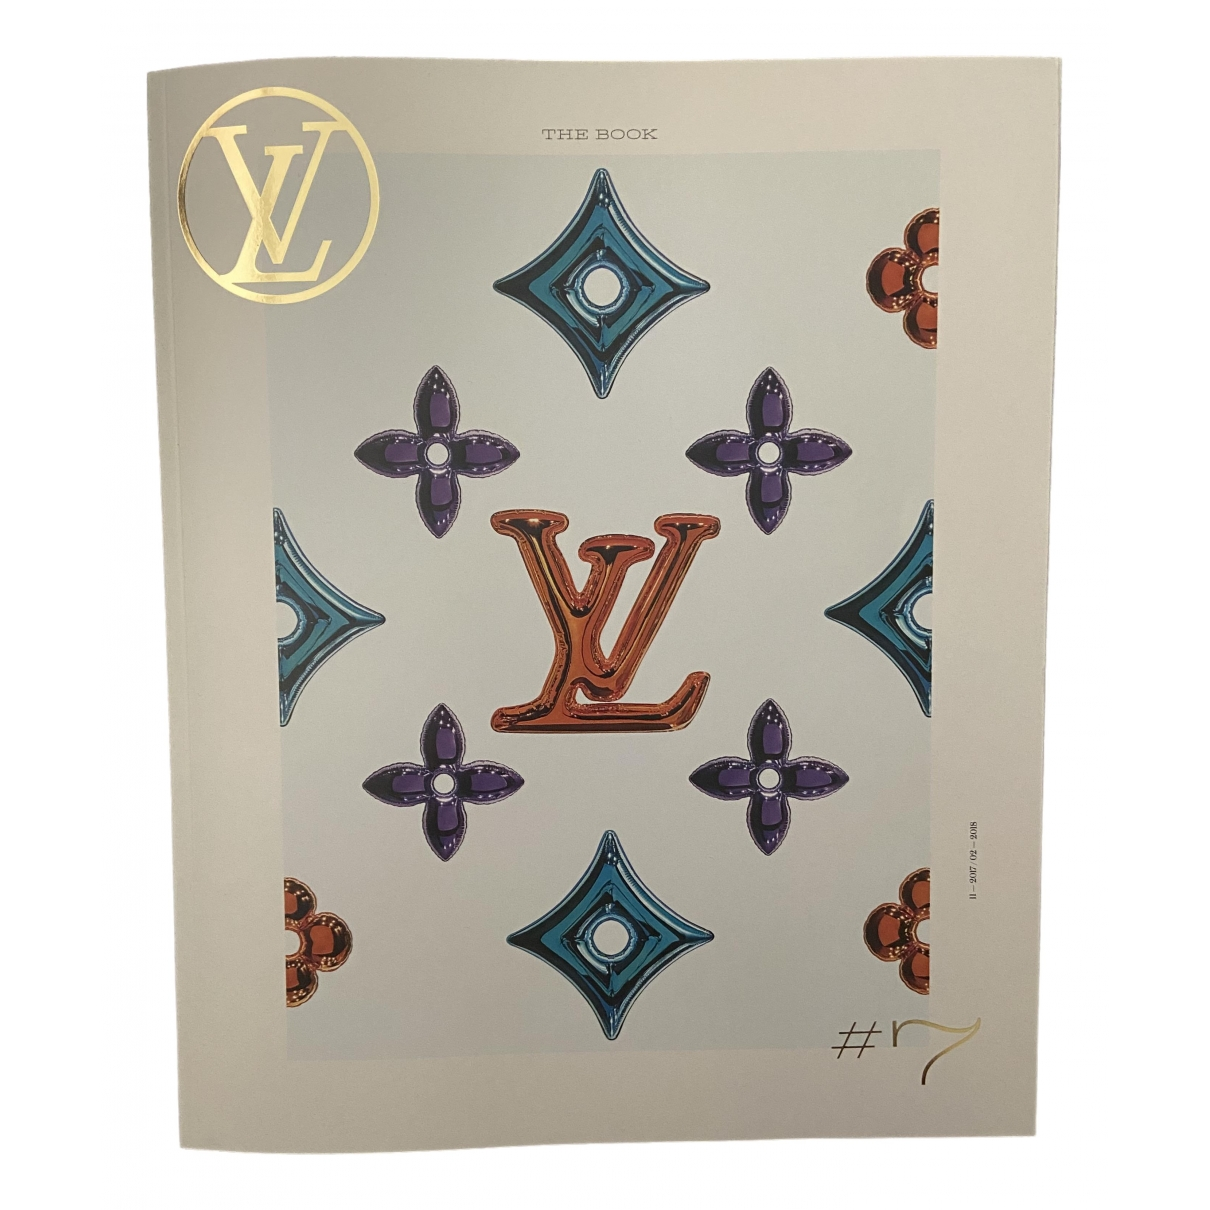 Fotografia Louis Vuitton